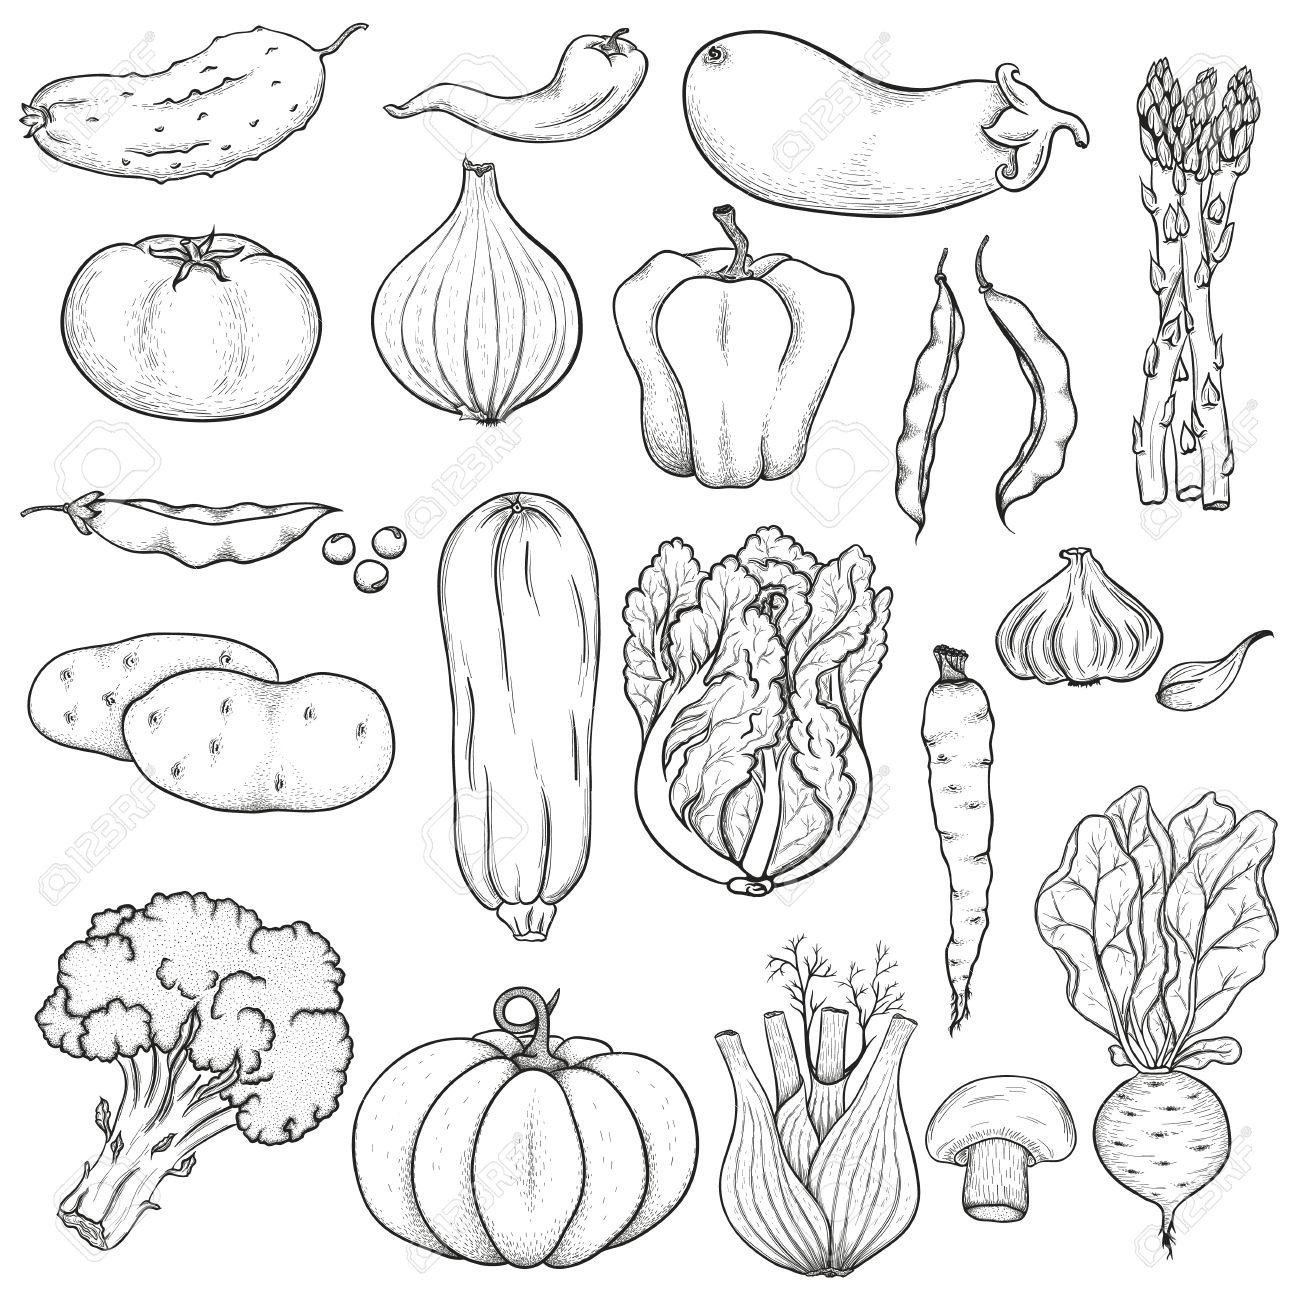 Drawn vegetable black and white White Google white black and